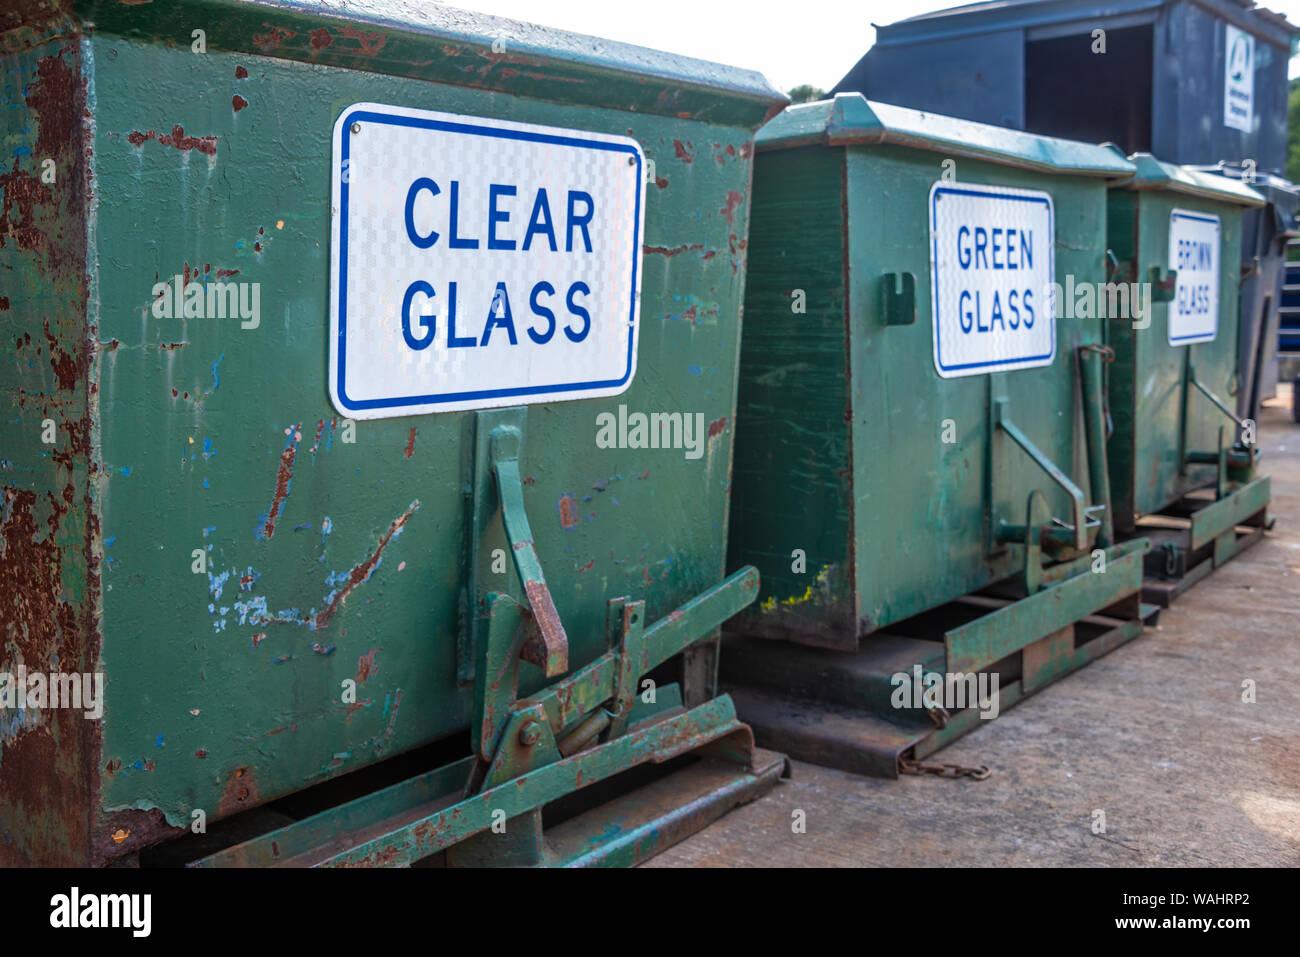 Glass recycling bins at the Snellville Recycling Center near Atlanta, Georgia. (USA) Stock Photo